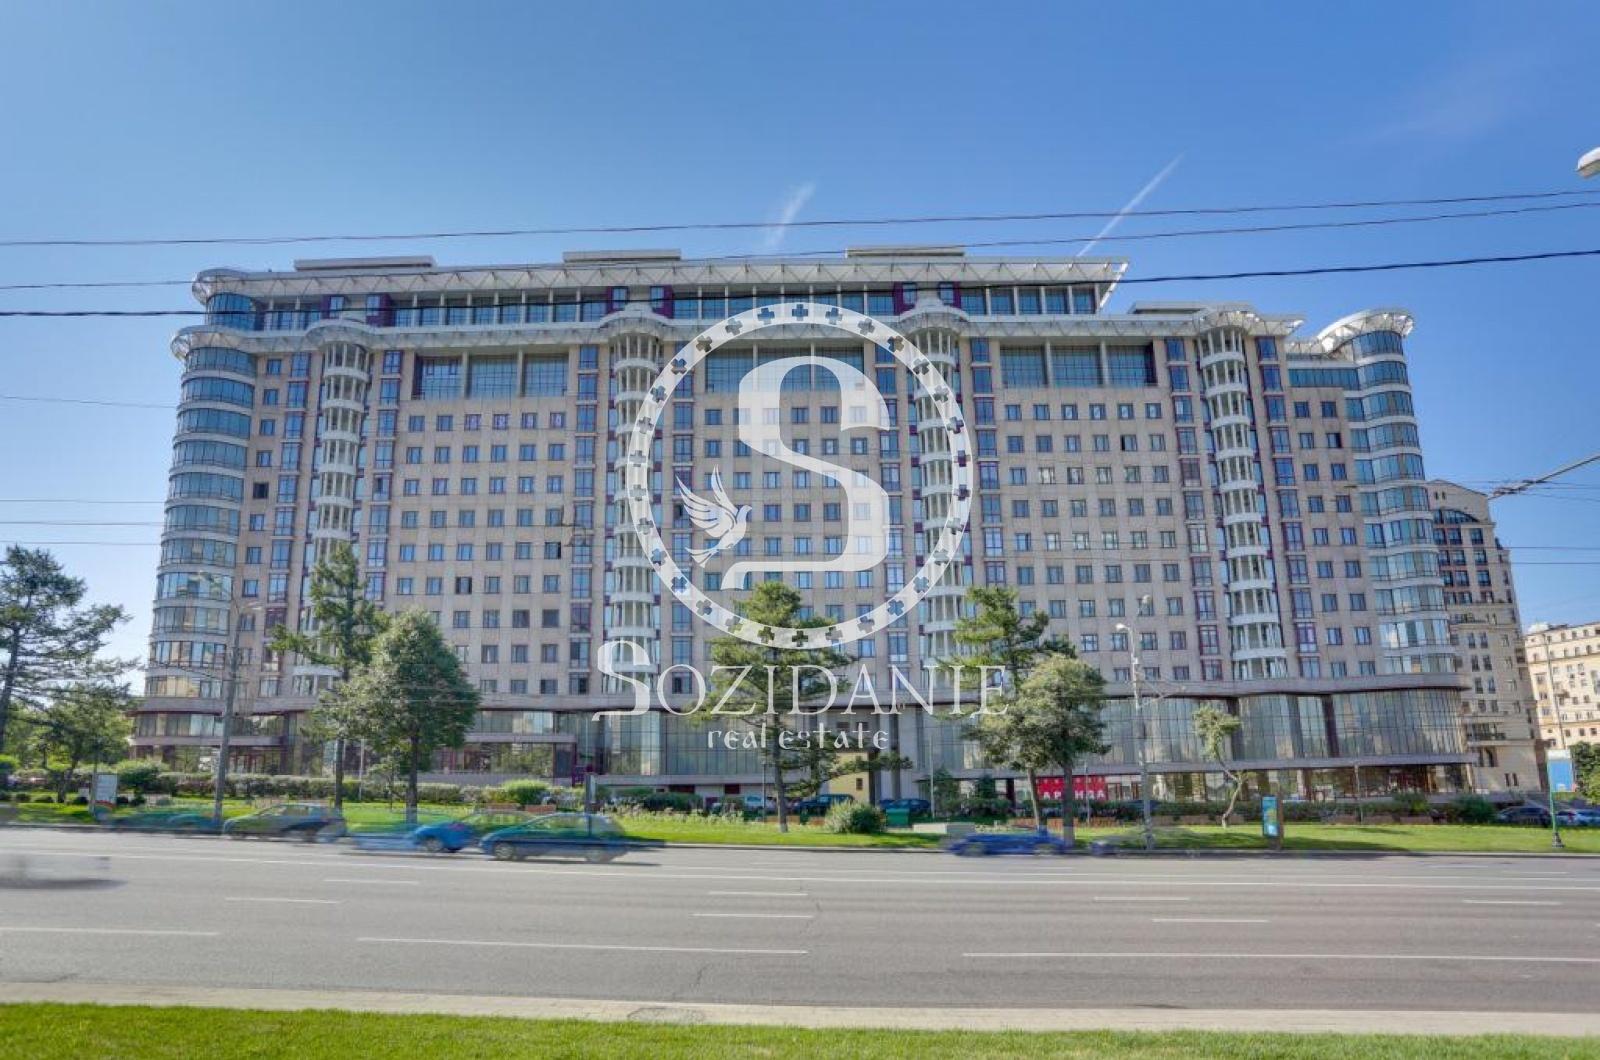 4 Комнаты, Городская, Продажа, Улица Новый арбат, Listing ID 3409, Москва, Россия,